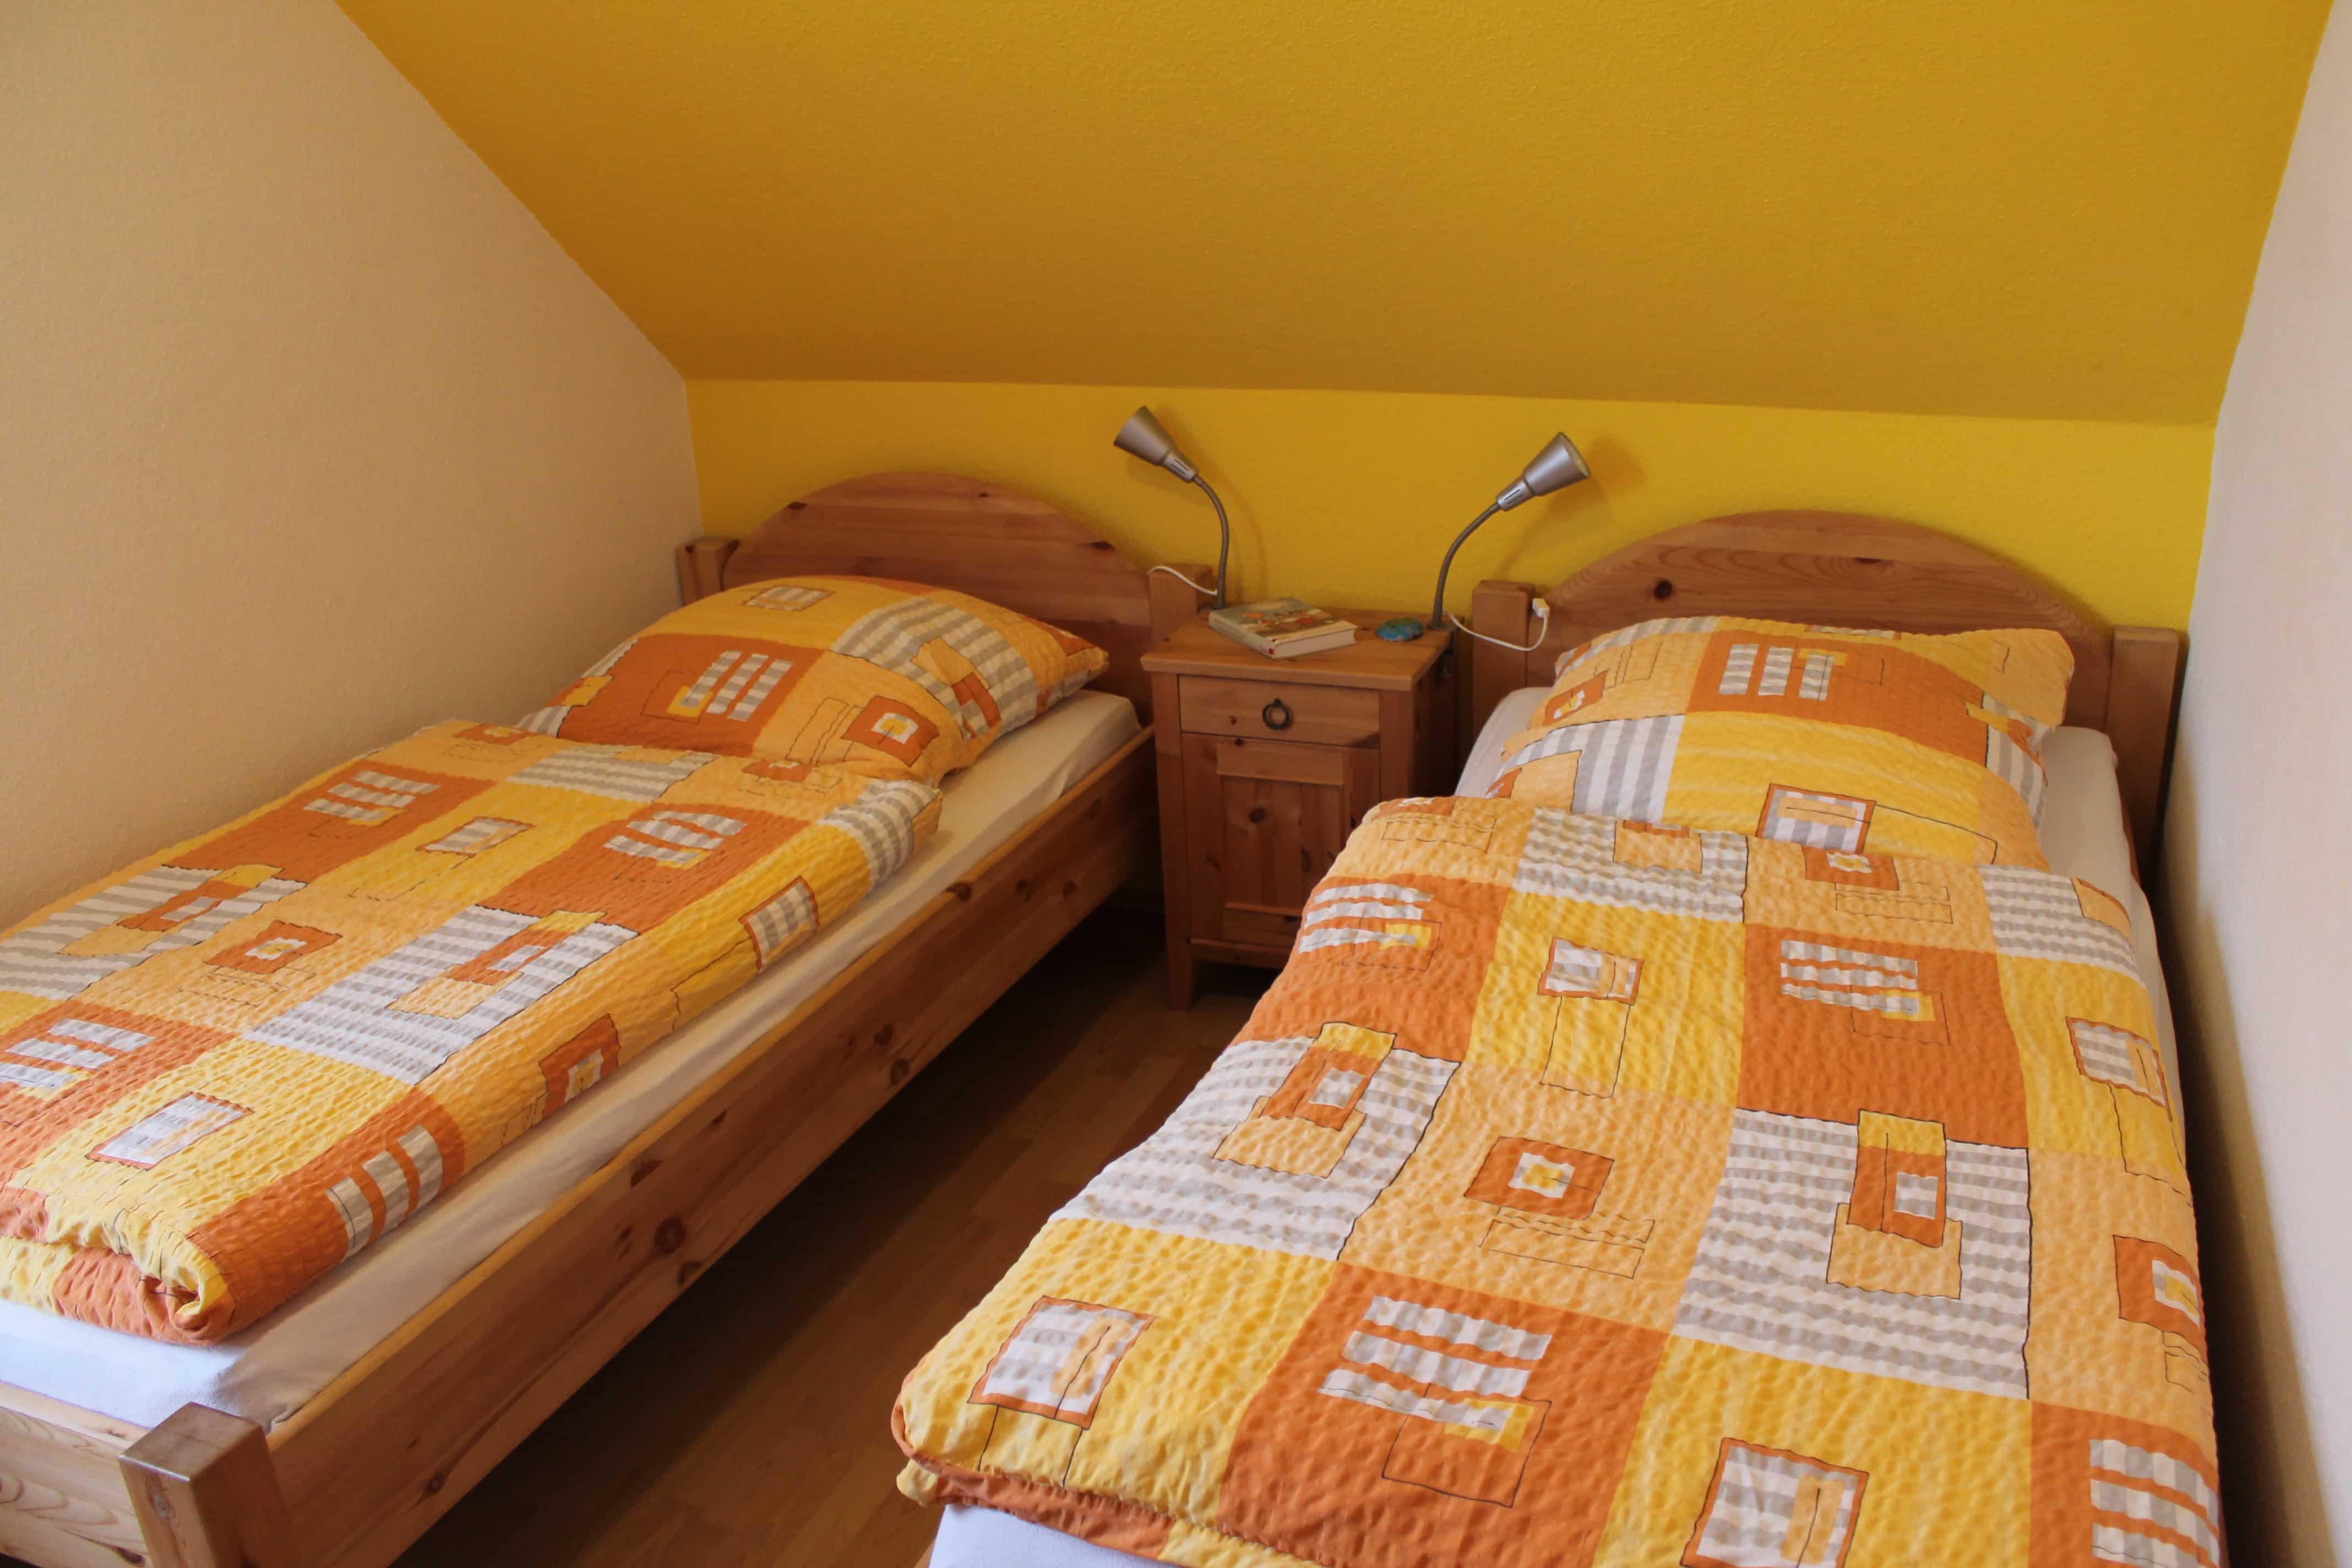 hausbeschreibung ferienhaus villa meeresleuchten. Black Bedroom Furniture Sets. Home Design Ideas